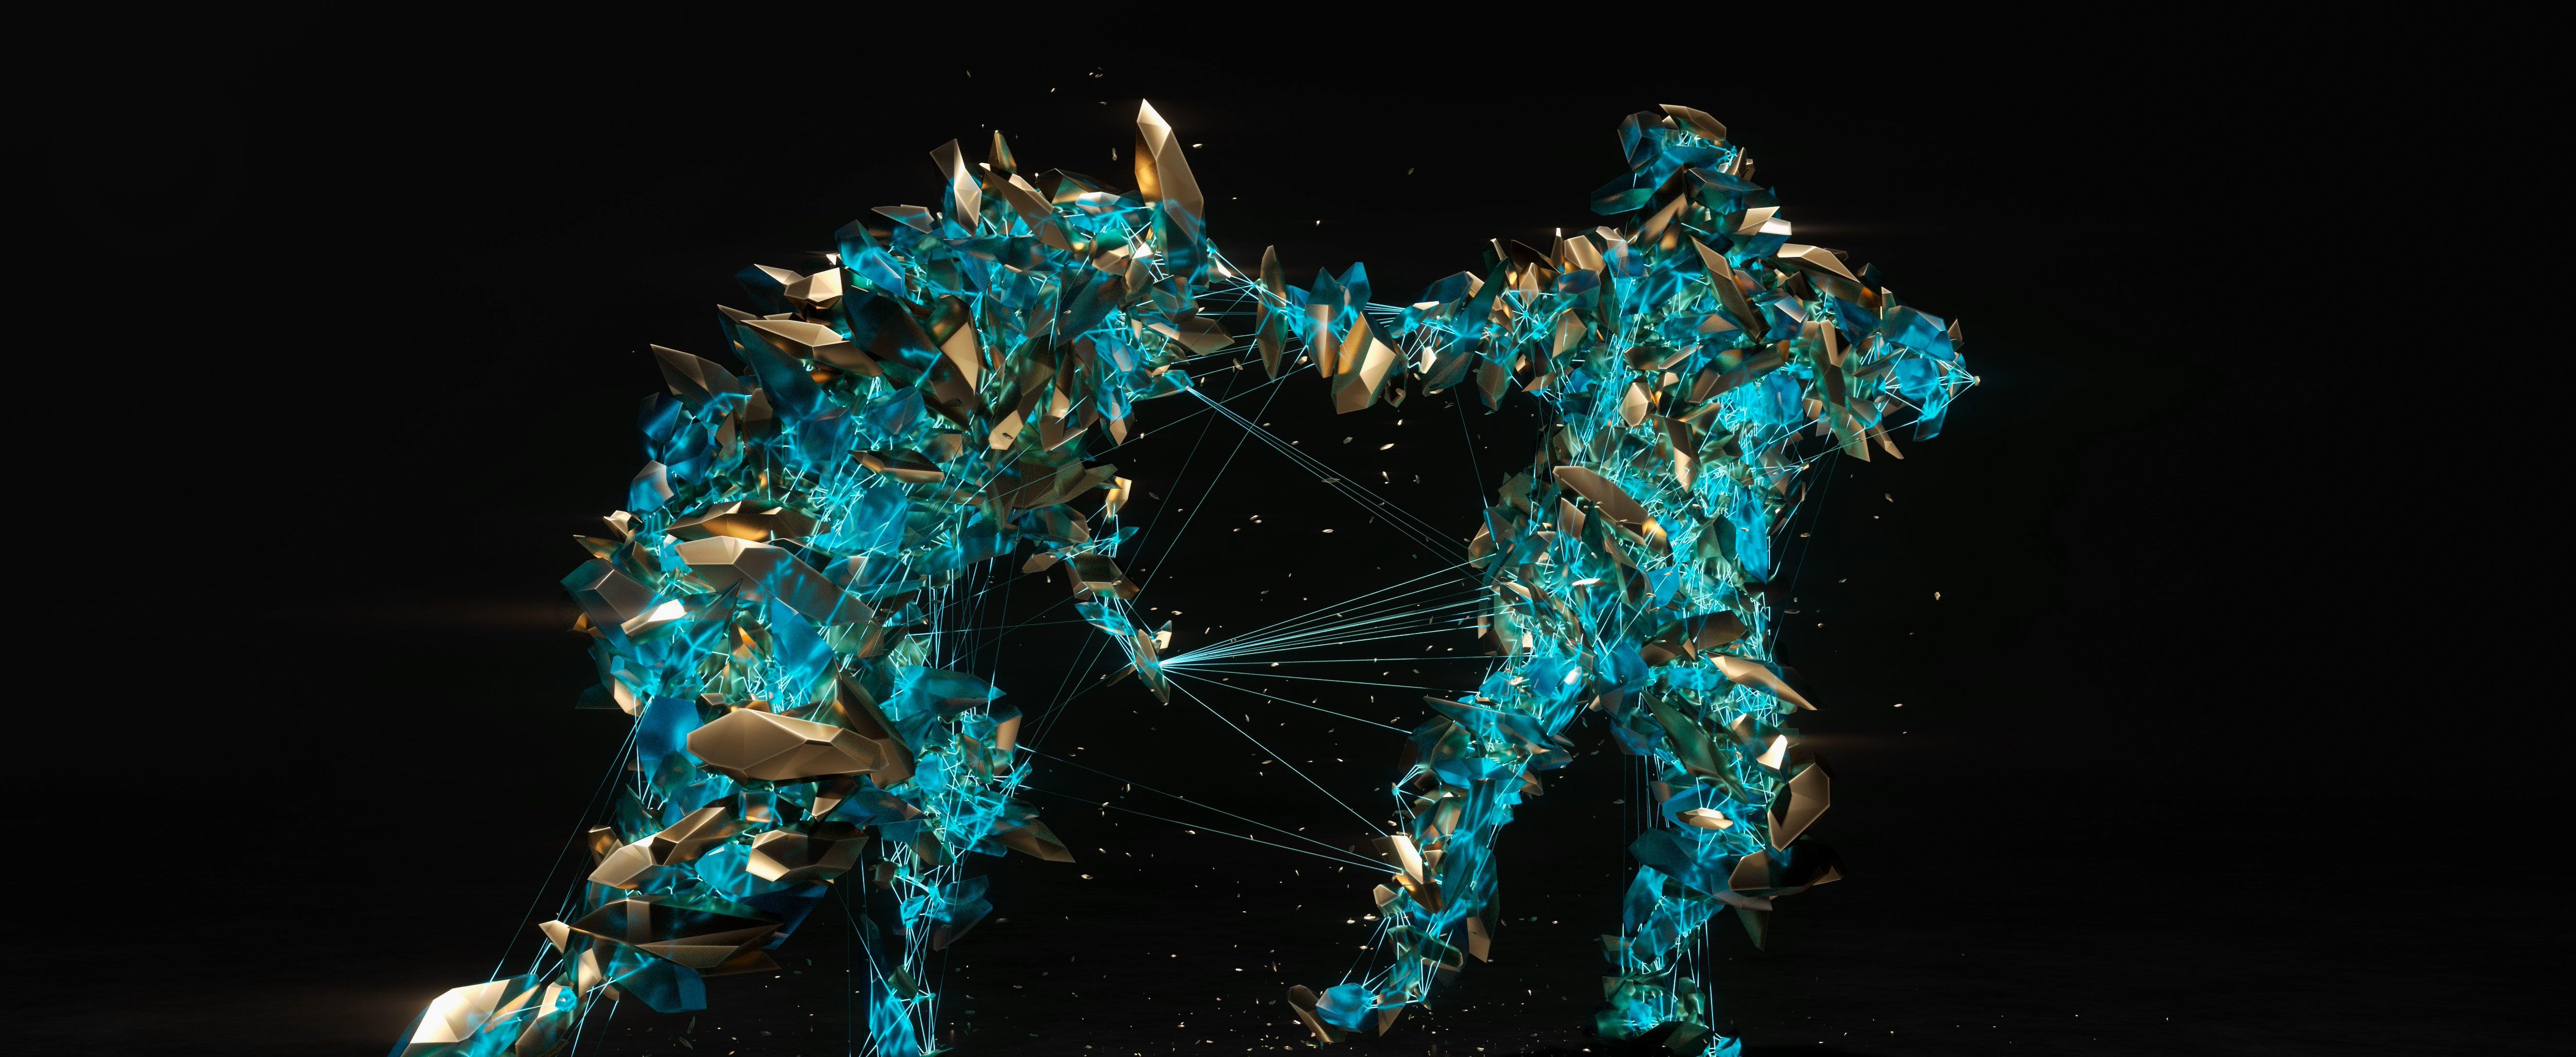 3D 그래픽 과정 이미지